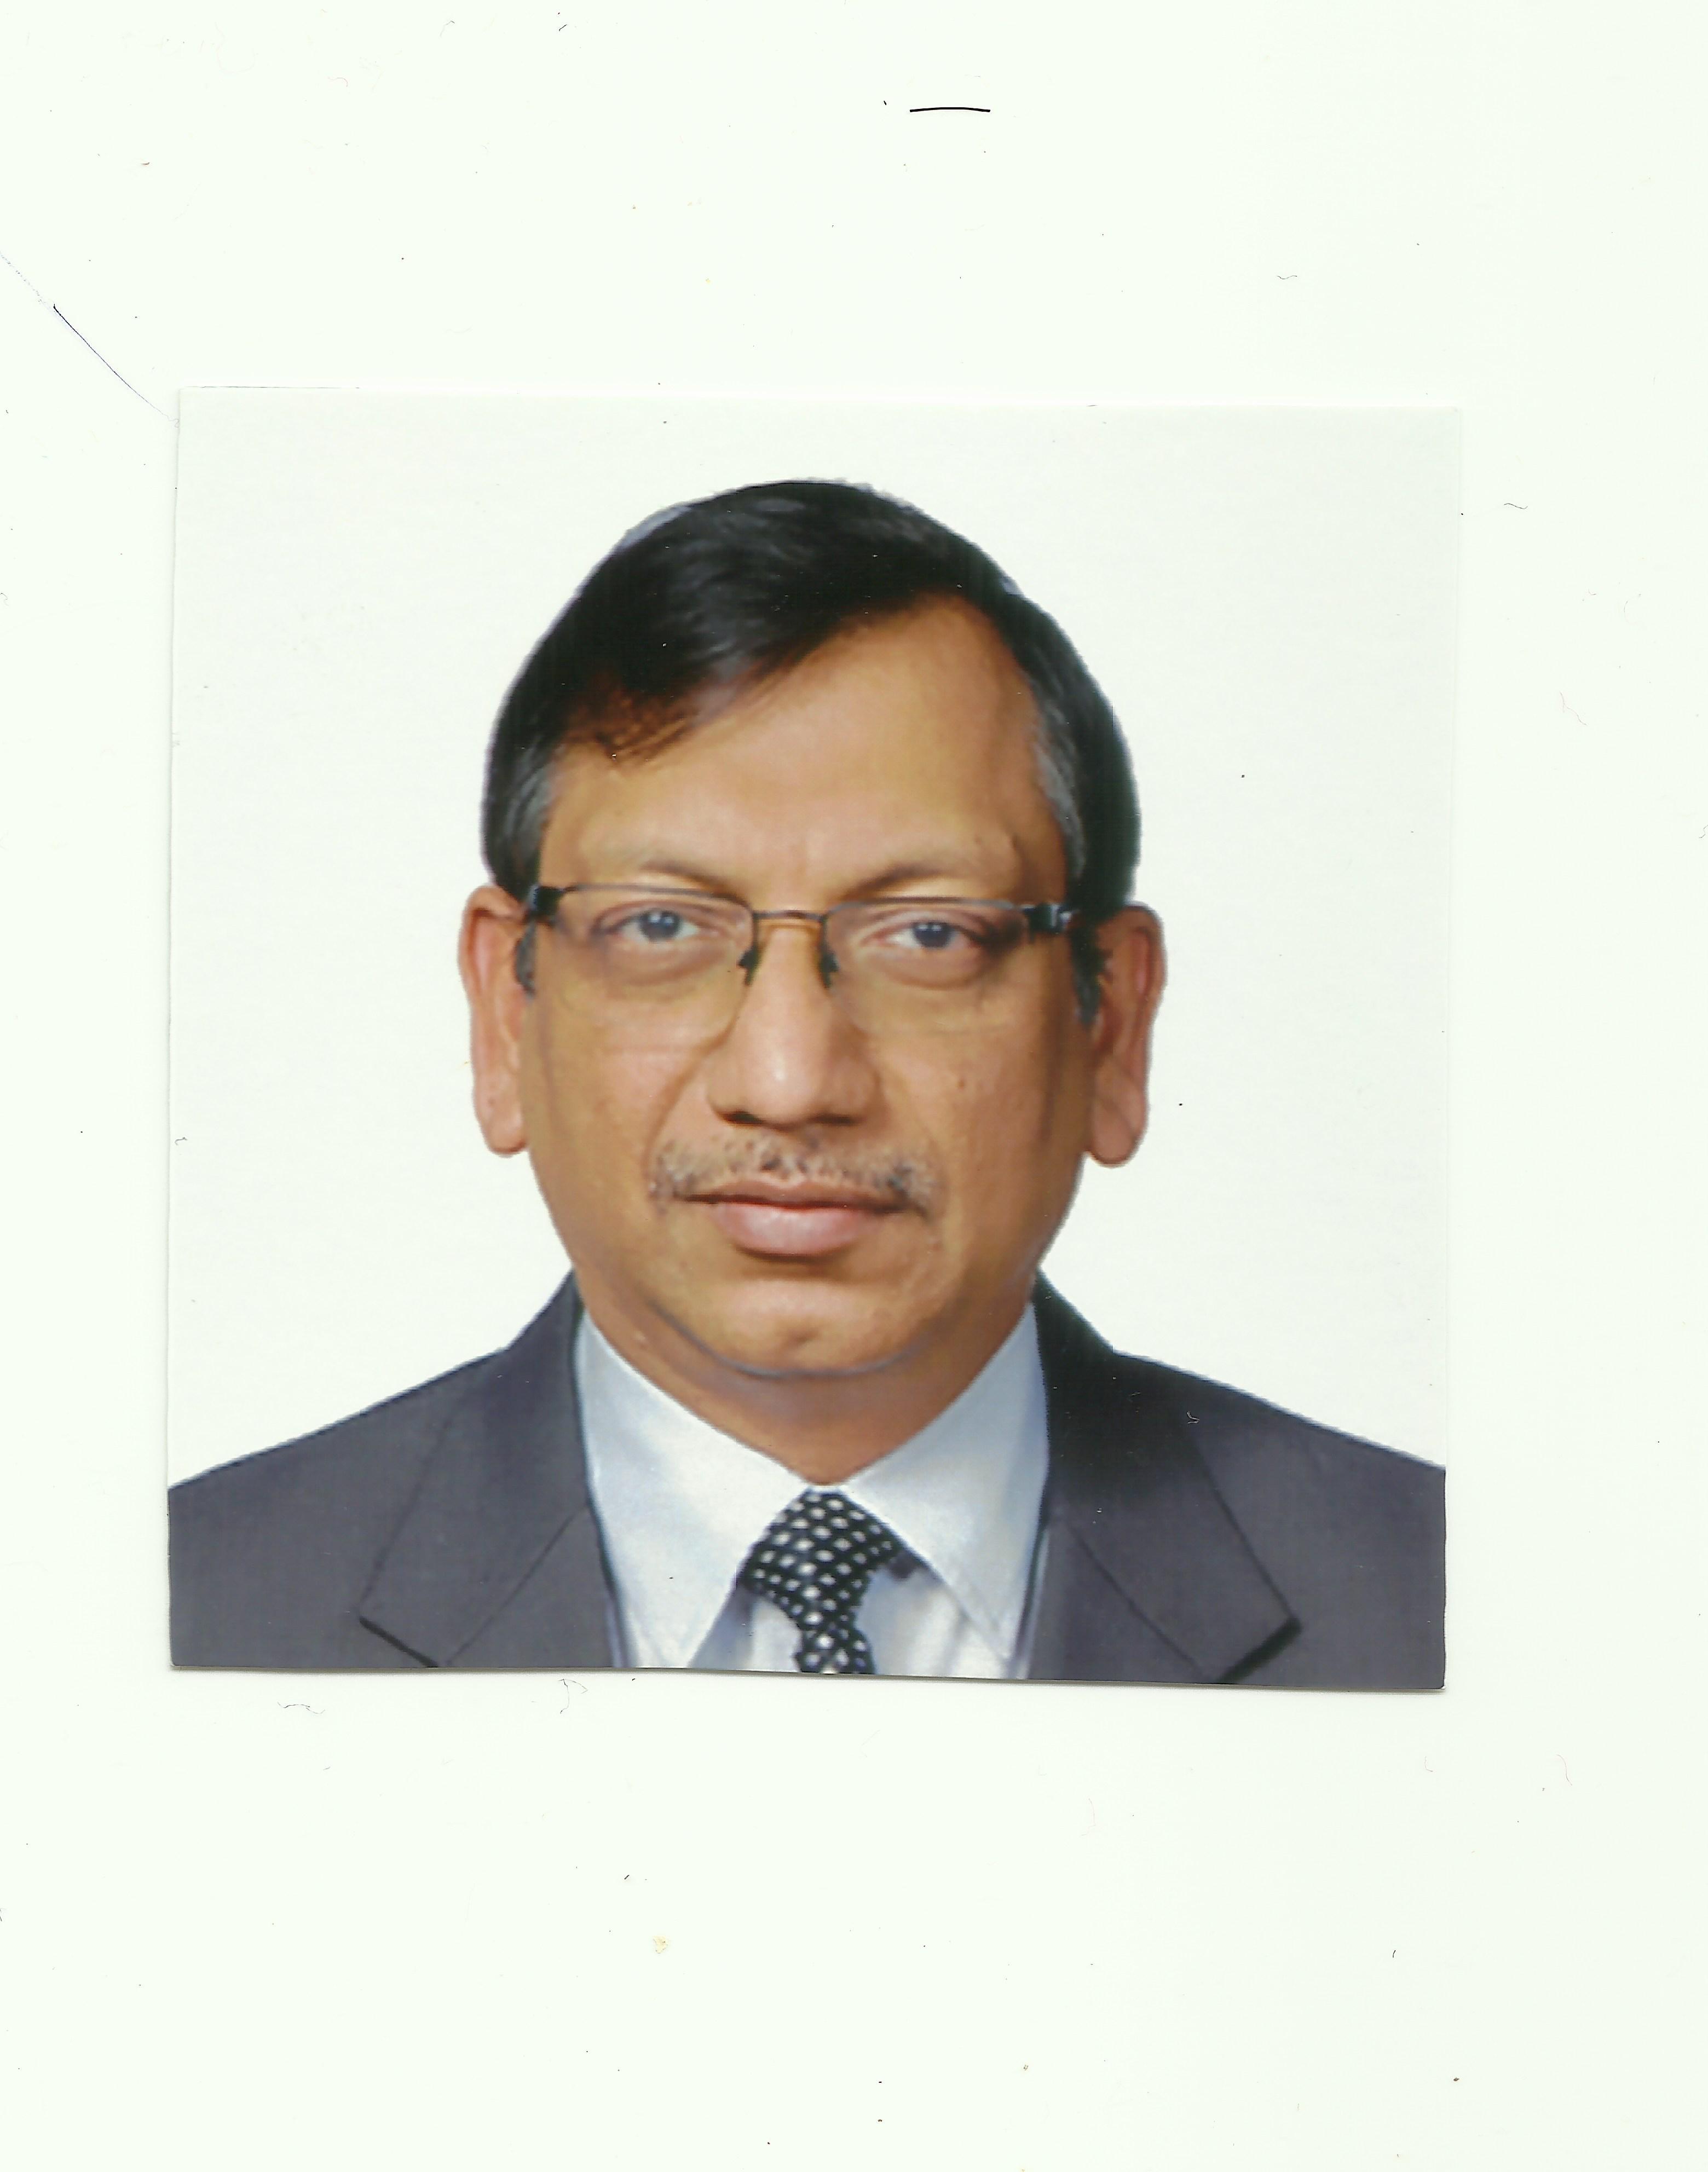 Dr. Sanjay Gupta - Diabetologist